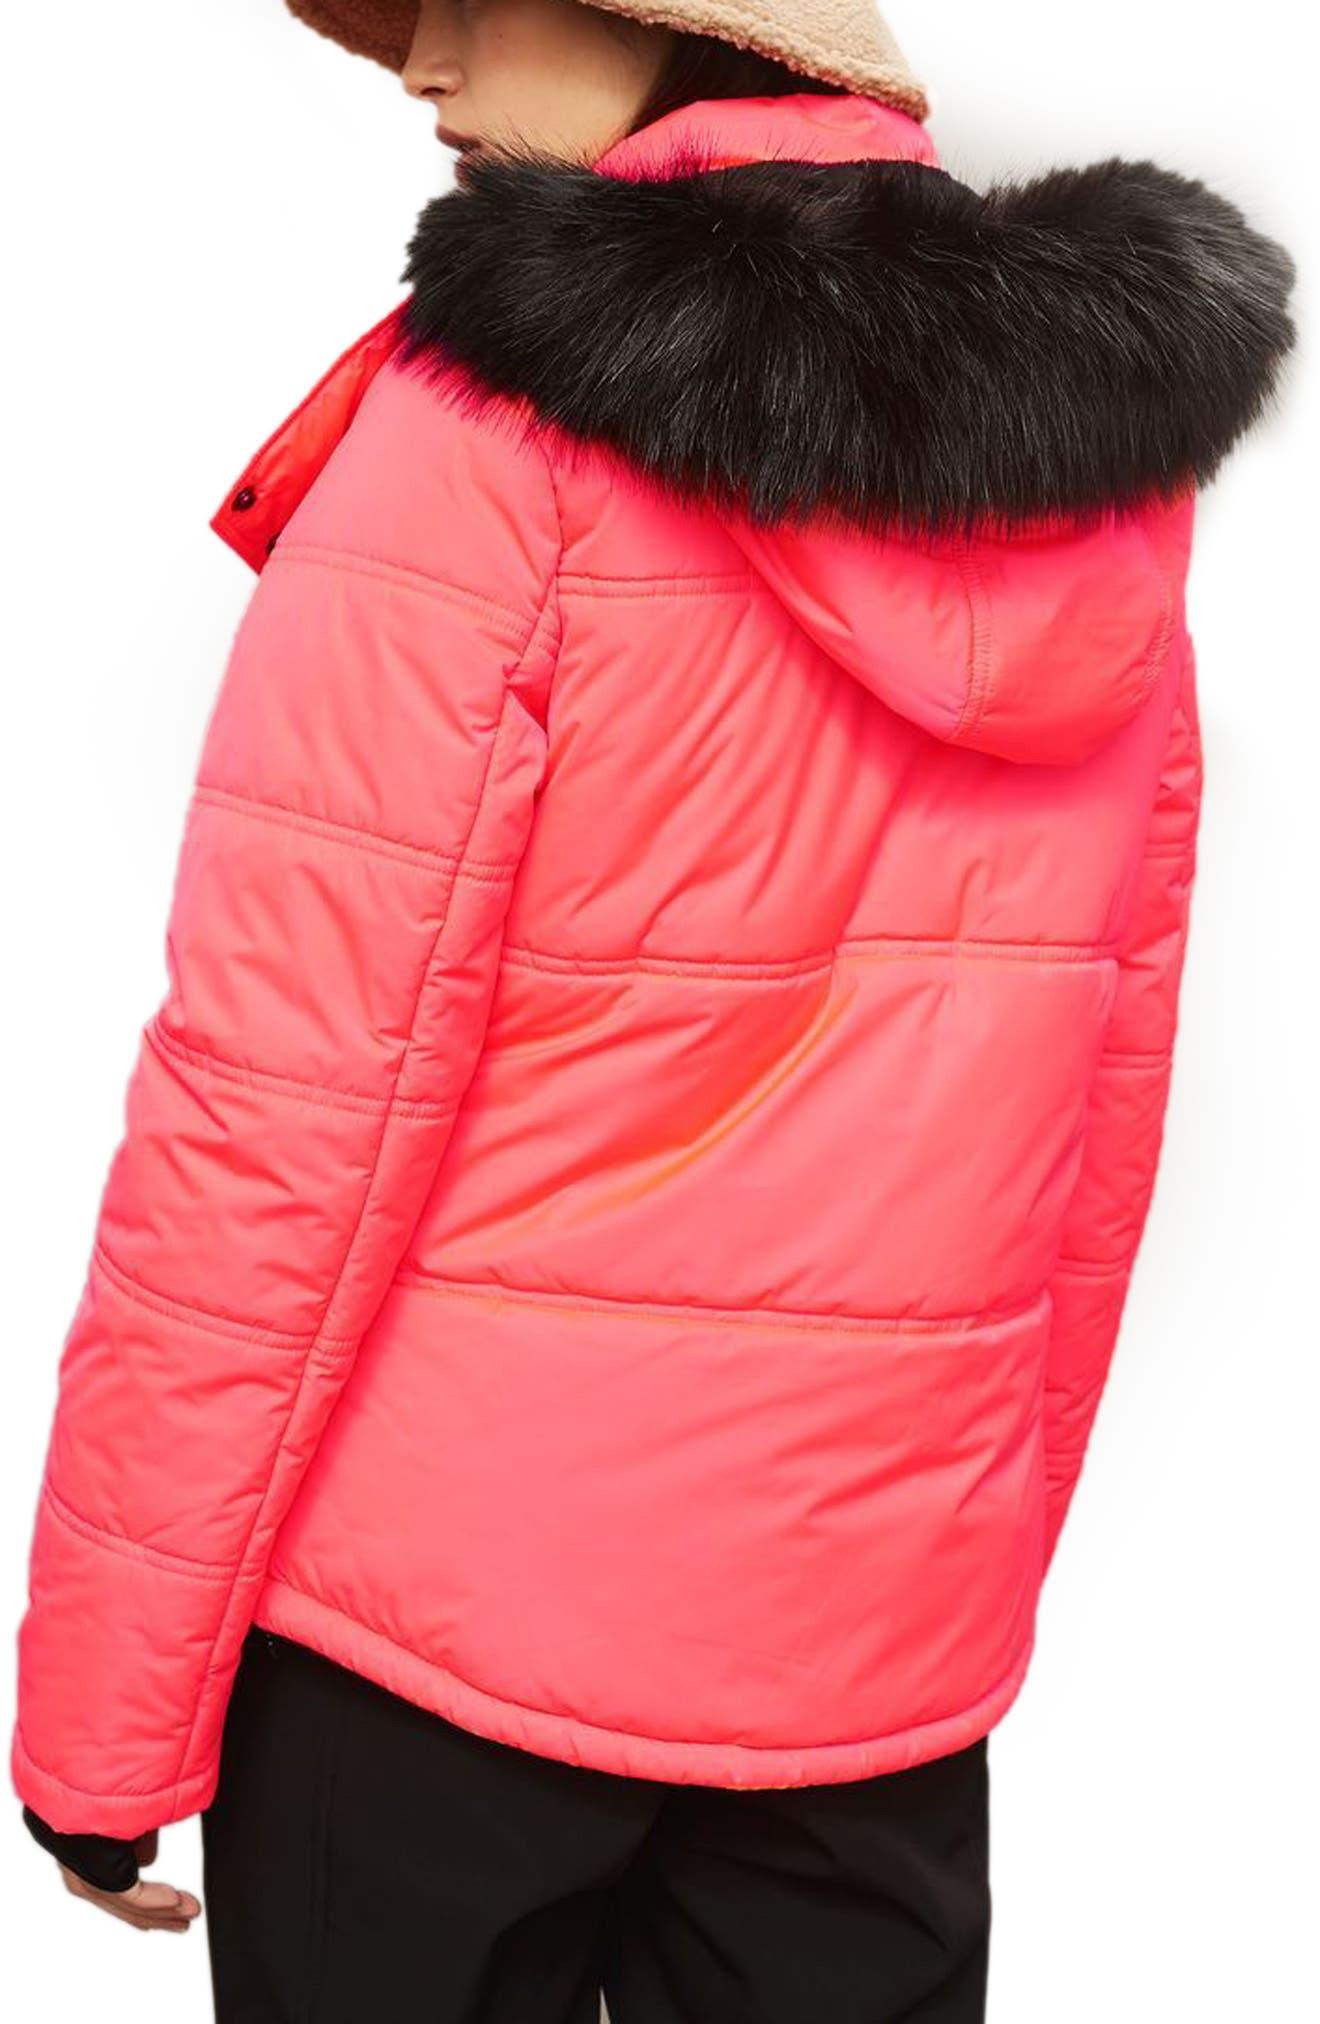 SNO Rio Faux Fur Hood Neon Puffer Jacket,                             Alternate thumbnail 2, color,                             650